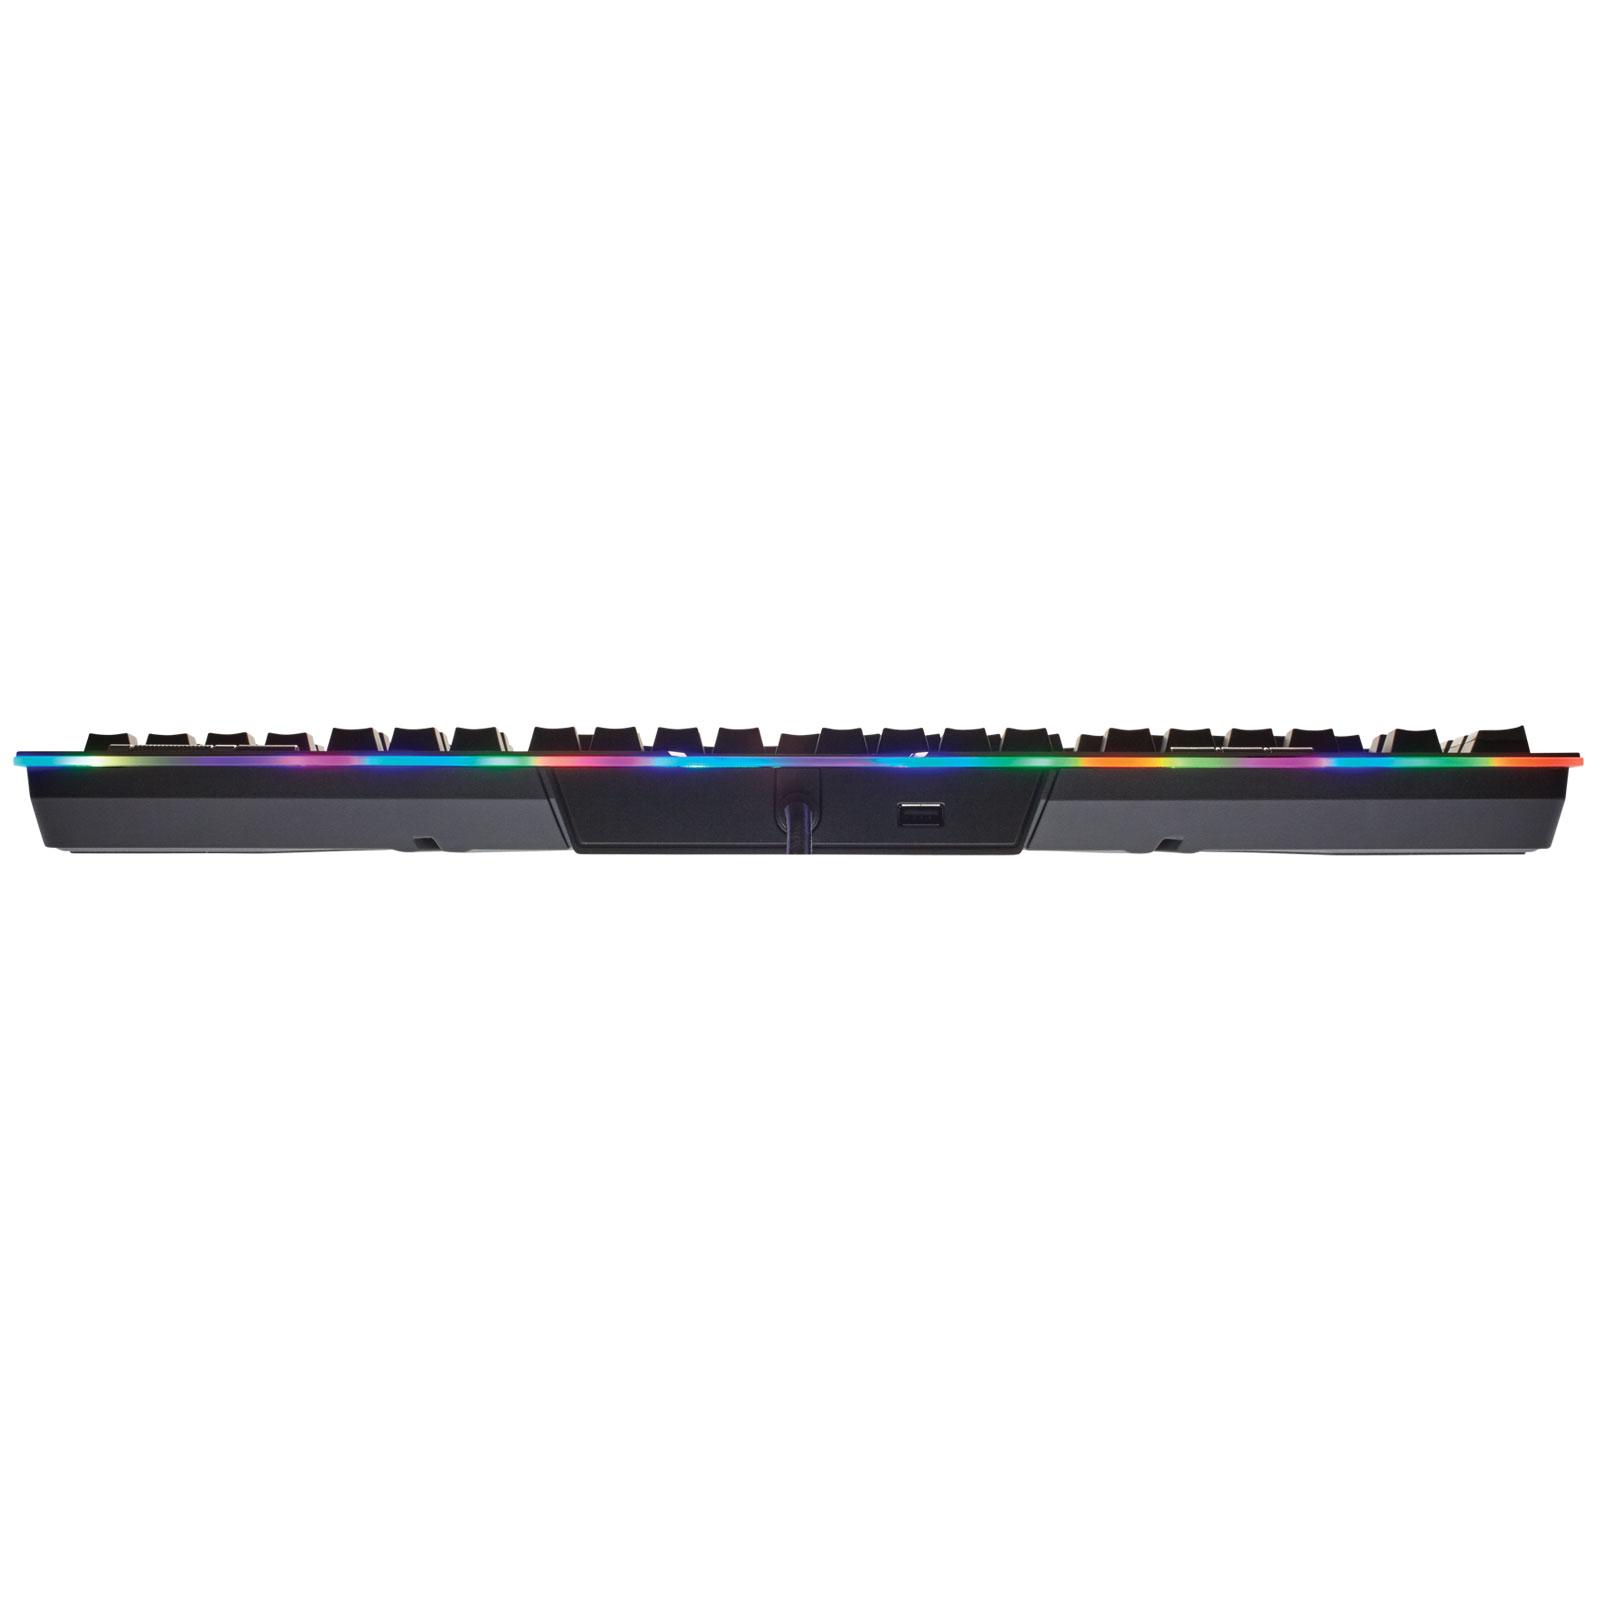 Corsair K95 RGB Platinum Mechanical MX BROWN - Clavier PC Corsair - 1